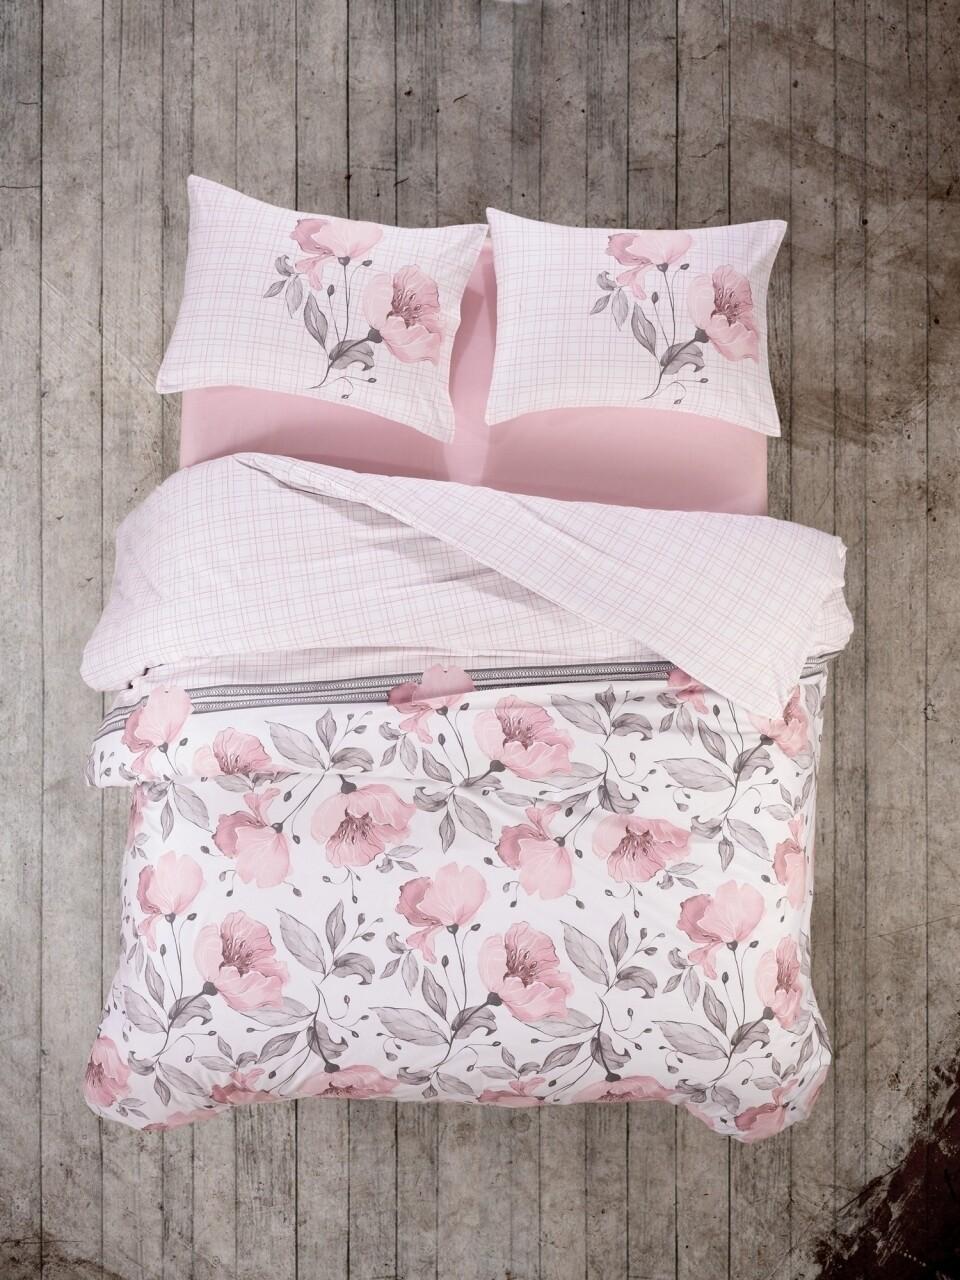 Lenjerie de pat pentru o persoana, 3 piese, 100% bumbac ranforce, Cotton Box, Juana